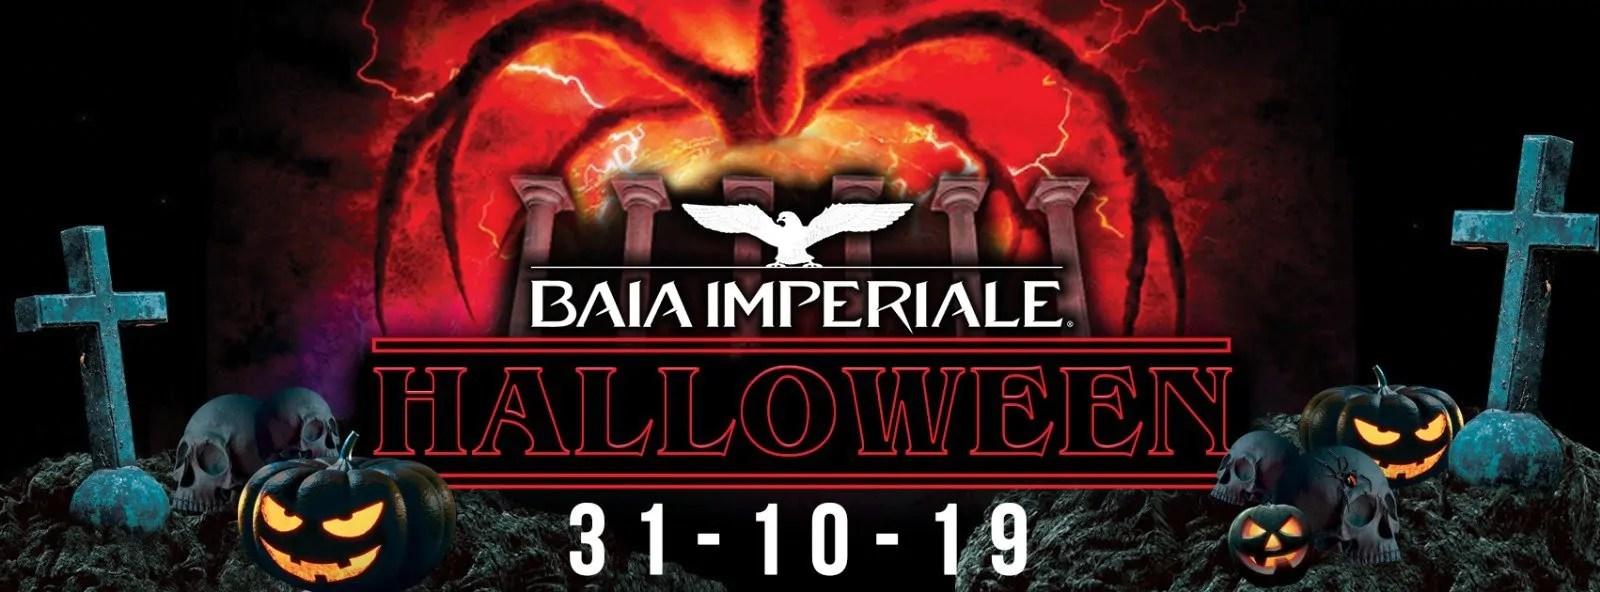 Halloween 2019 Baia Imperiale 31 10 2019